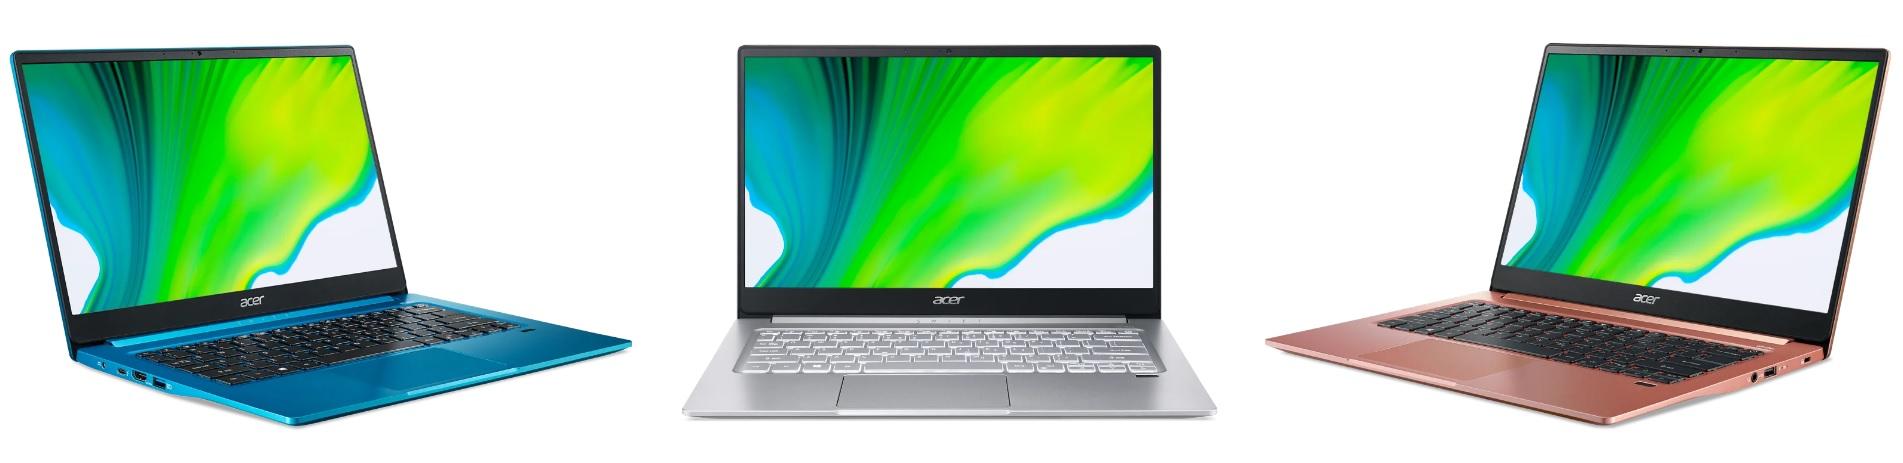 Acer Swift 3 SF314-59 laptop